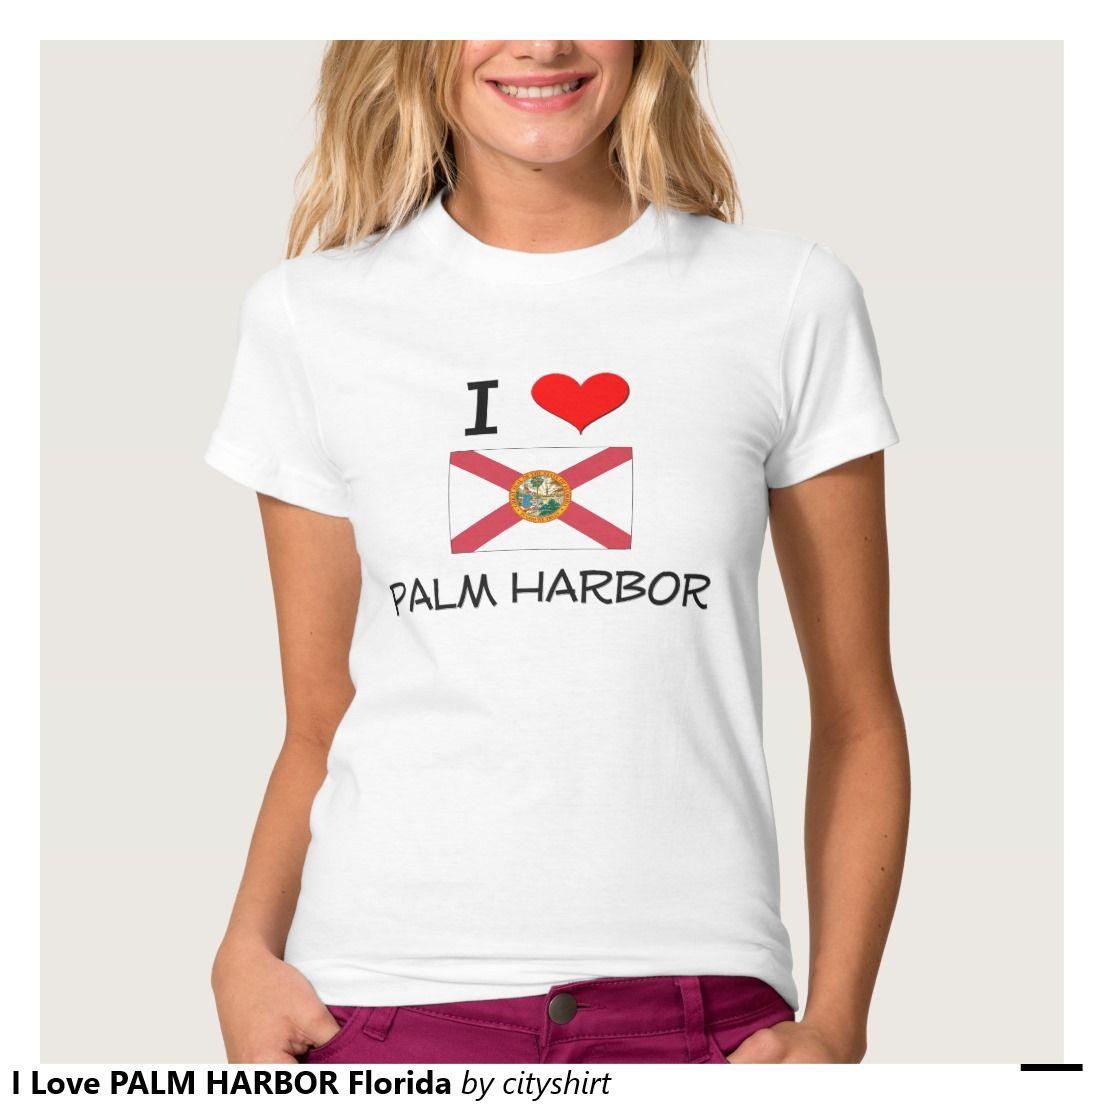 I Love PALM HARBOR Florida T-shirts